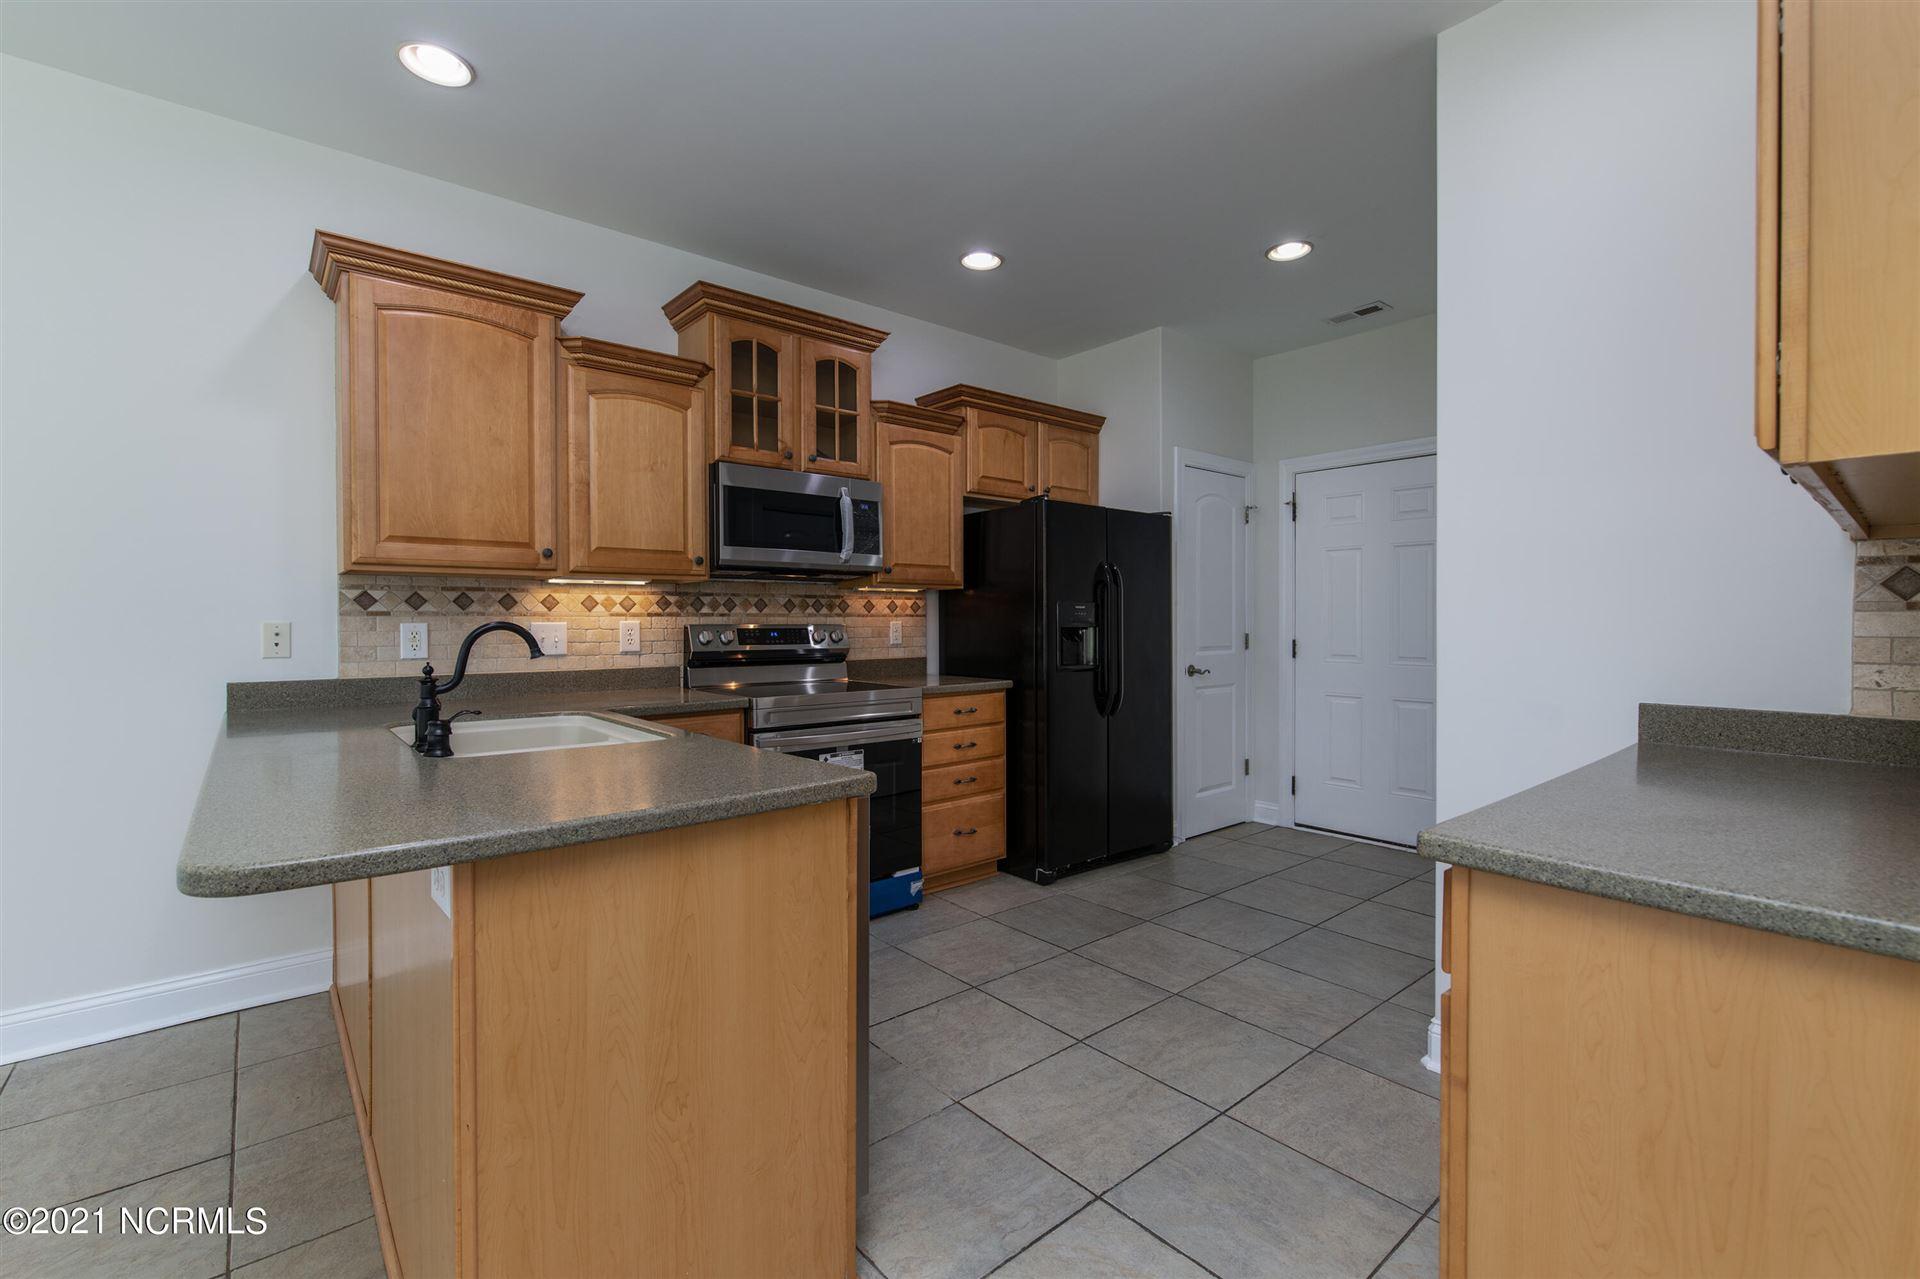 Photo of 114 Jordan Drive, New Bern, NC 28562 (MLS # 100293380)